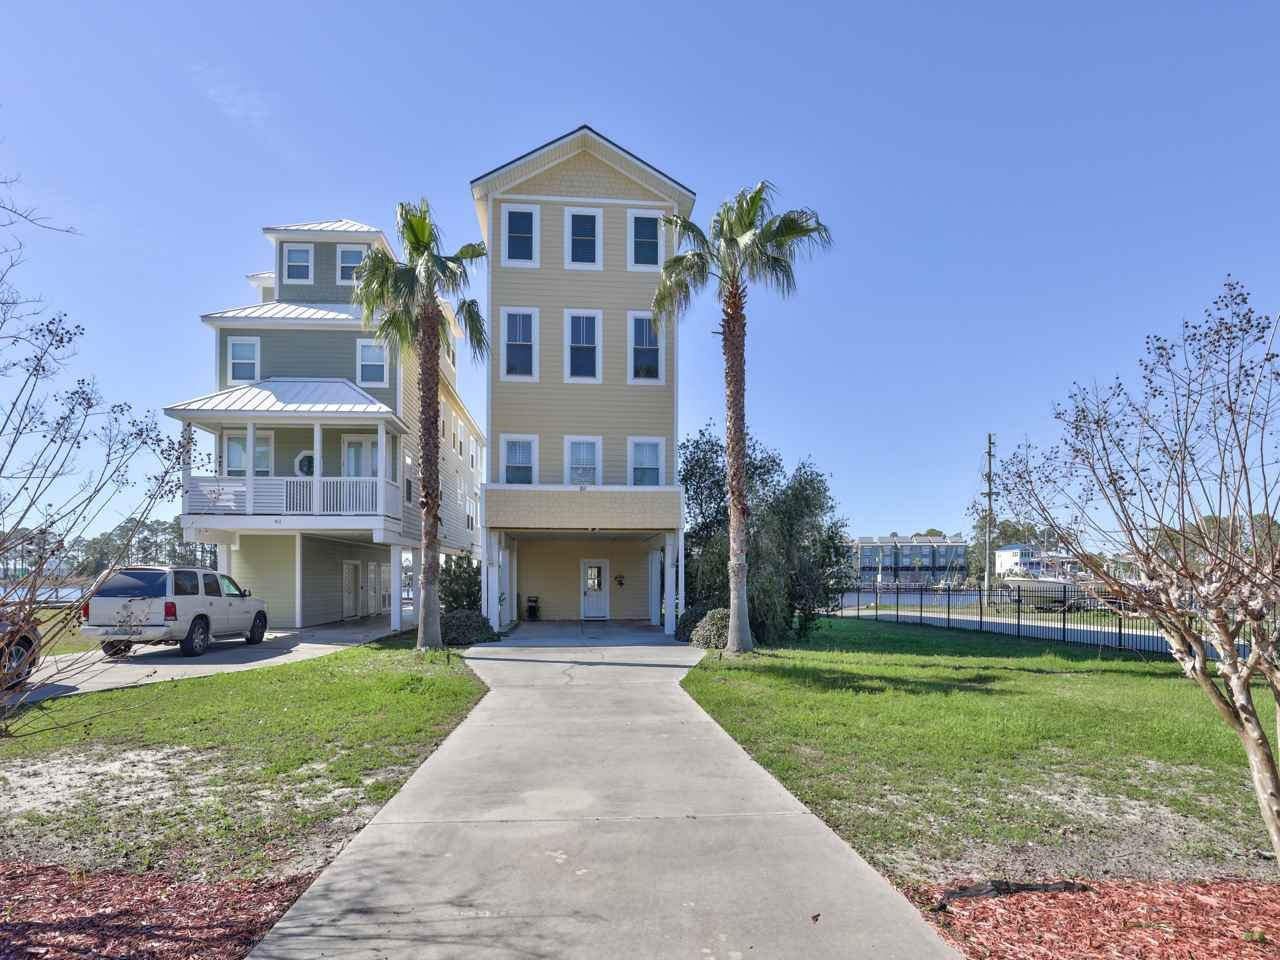 811 South Marine Street, Carabelle, FL 32323 - MLS#: 328249